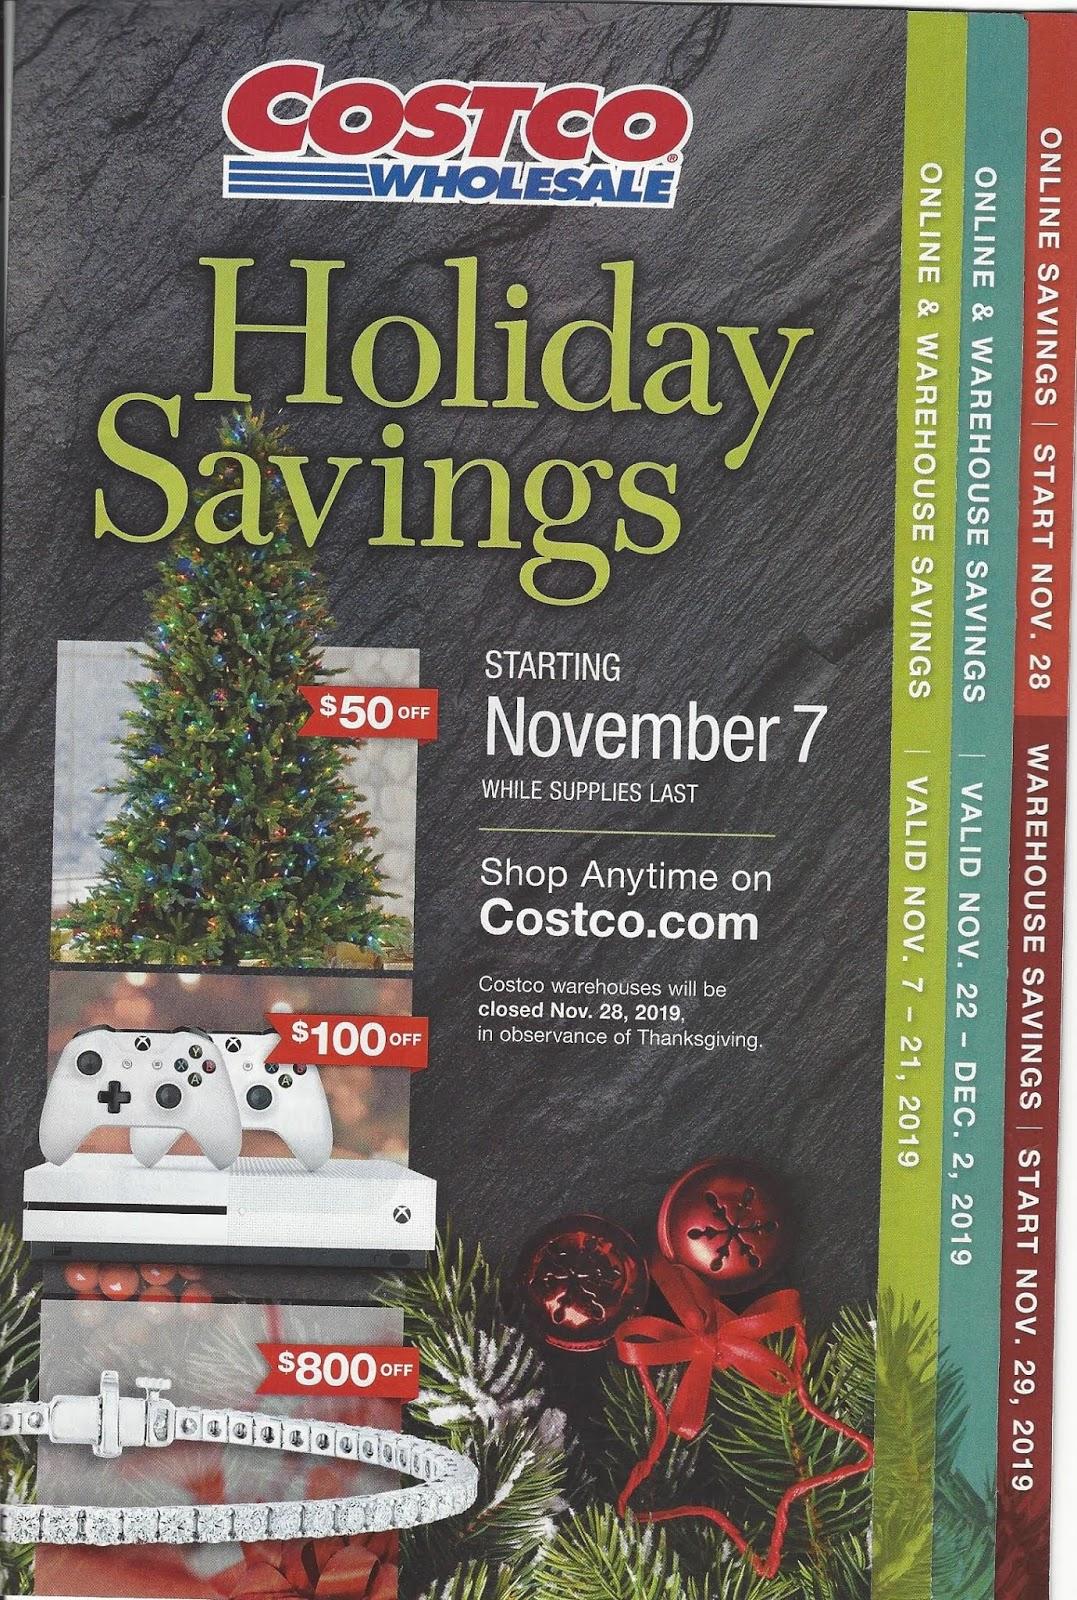 Costco Holiday Savings 2019